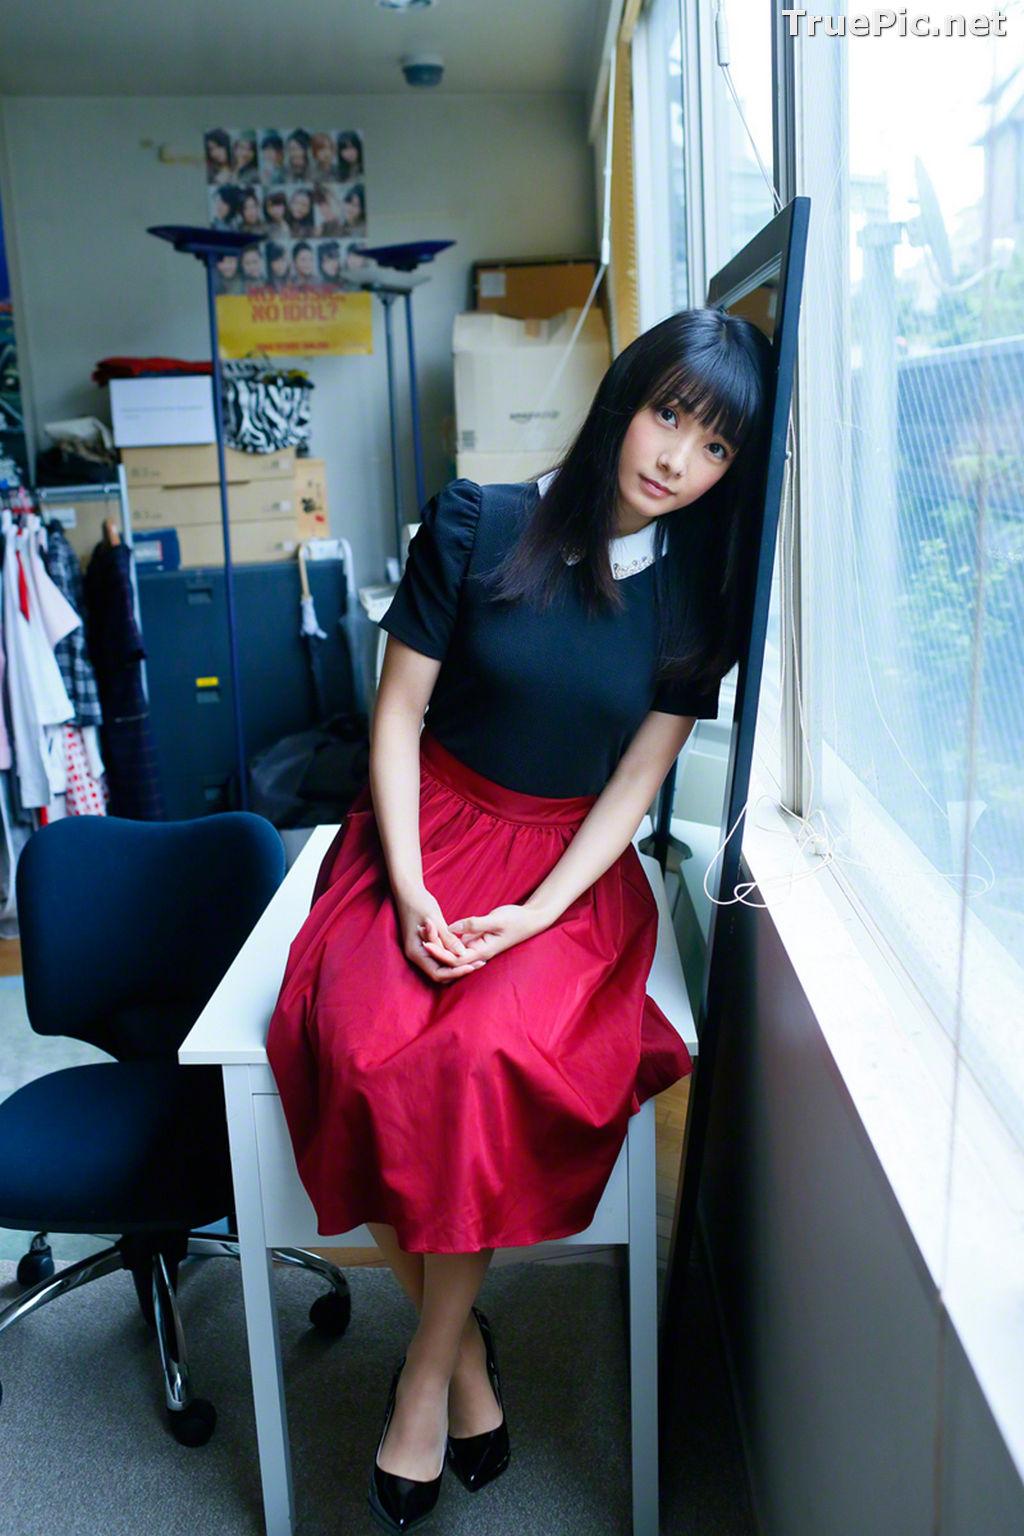 Image Wanibooks No.137 – Japanese Idol Singer and Actress – Erika Tonooka - TruePic.net - Picture-2